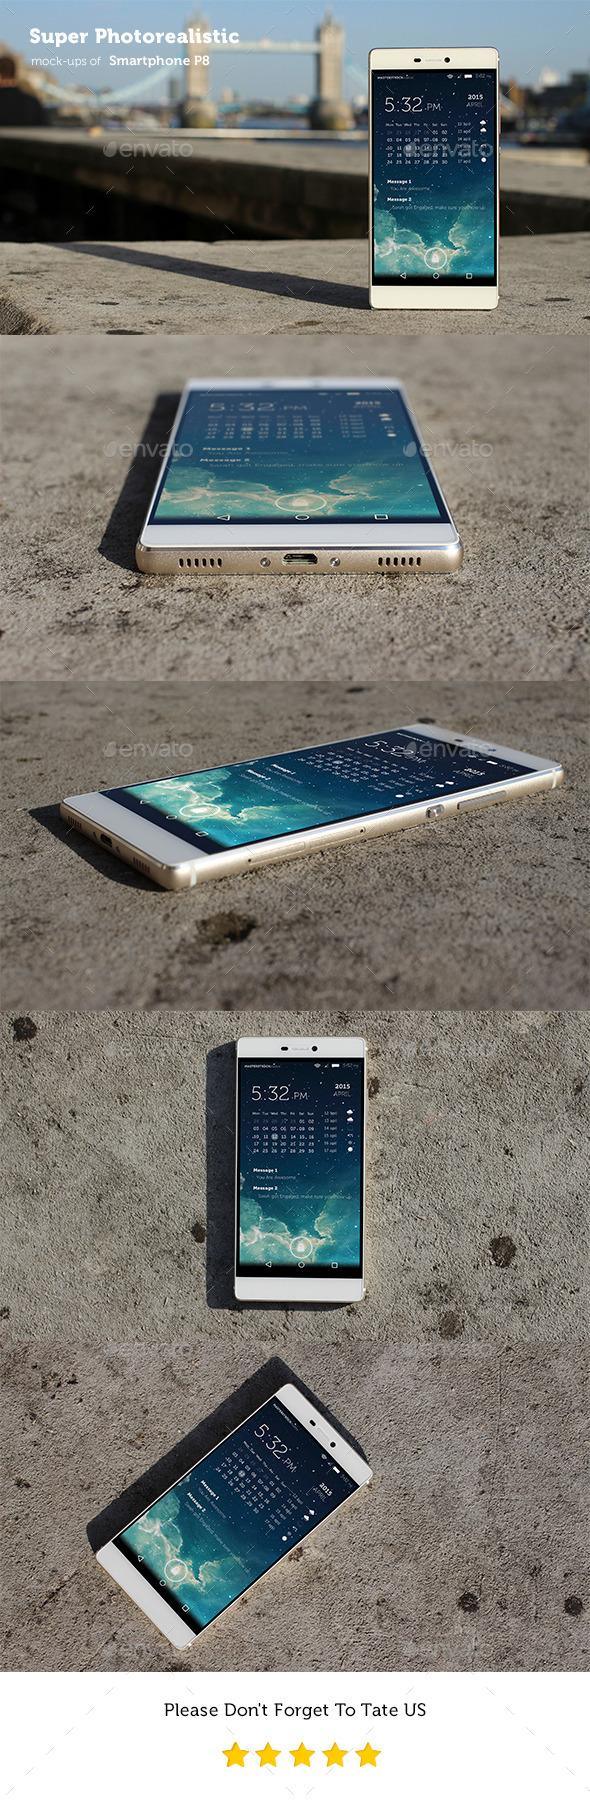 GraphicRiver Photorealistic Smartphone P8 Mockups 11269444